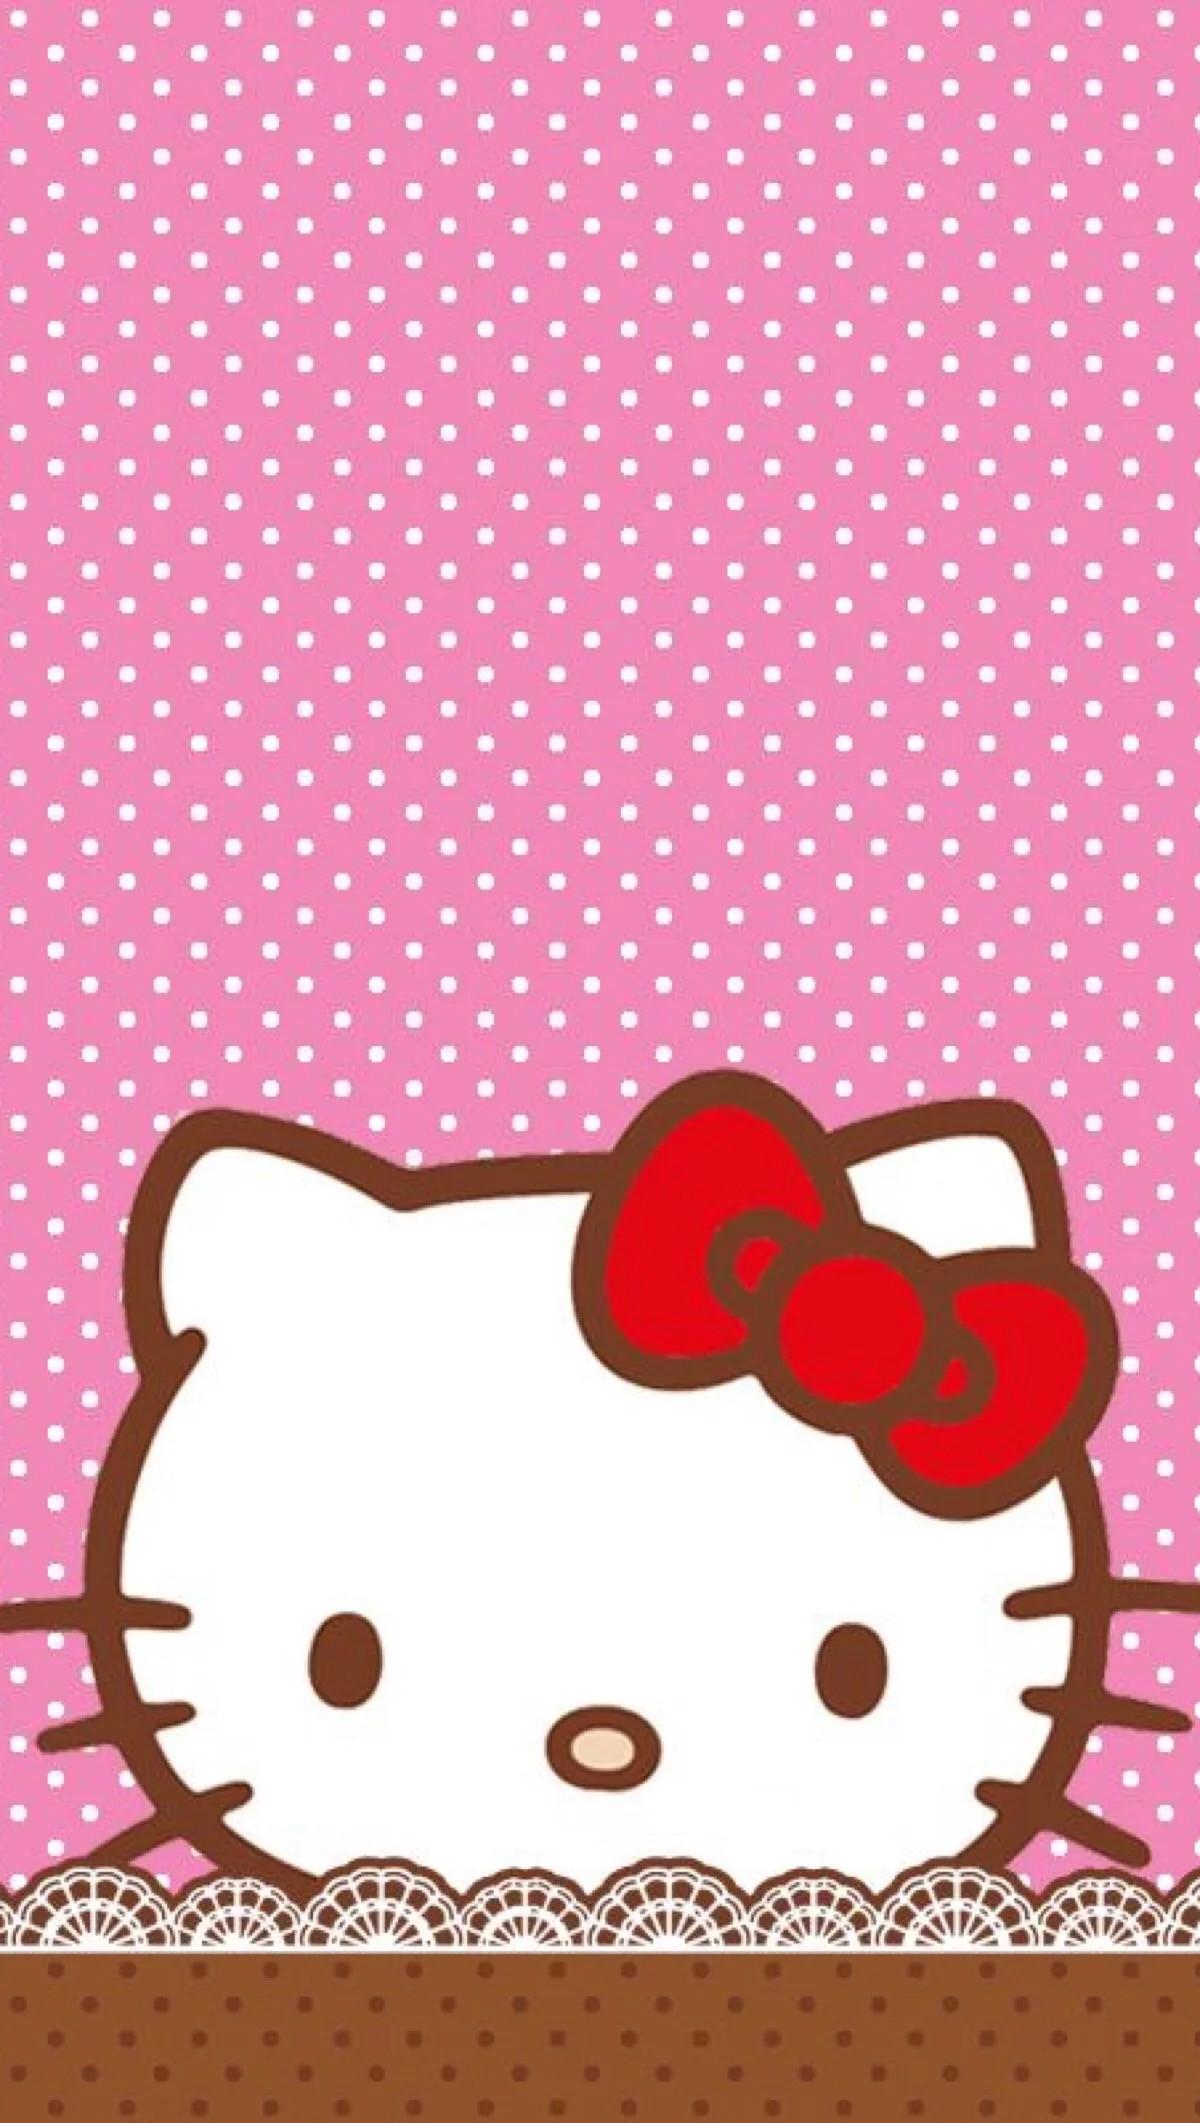 Mac hello kitty wallpaper